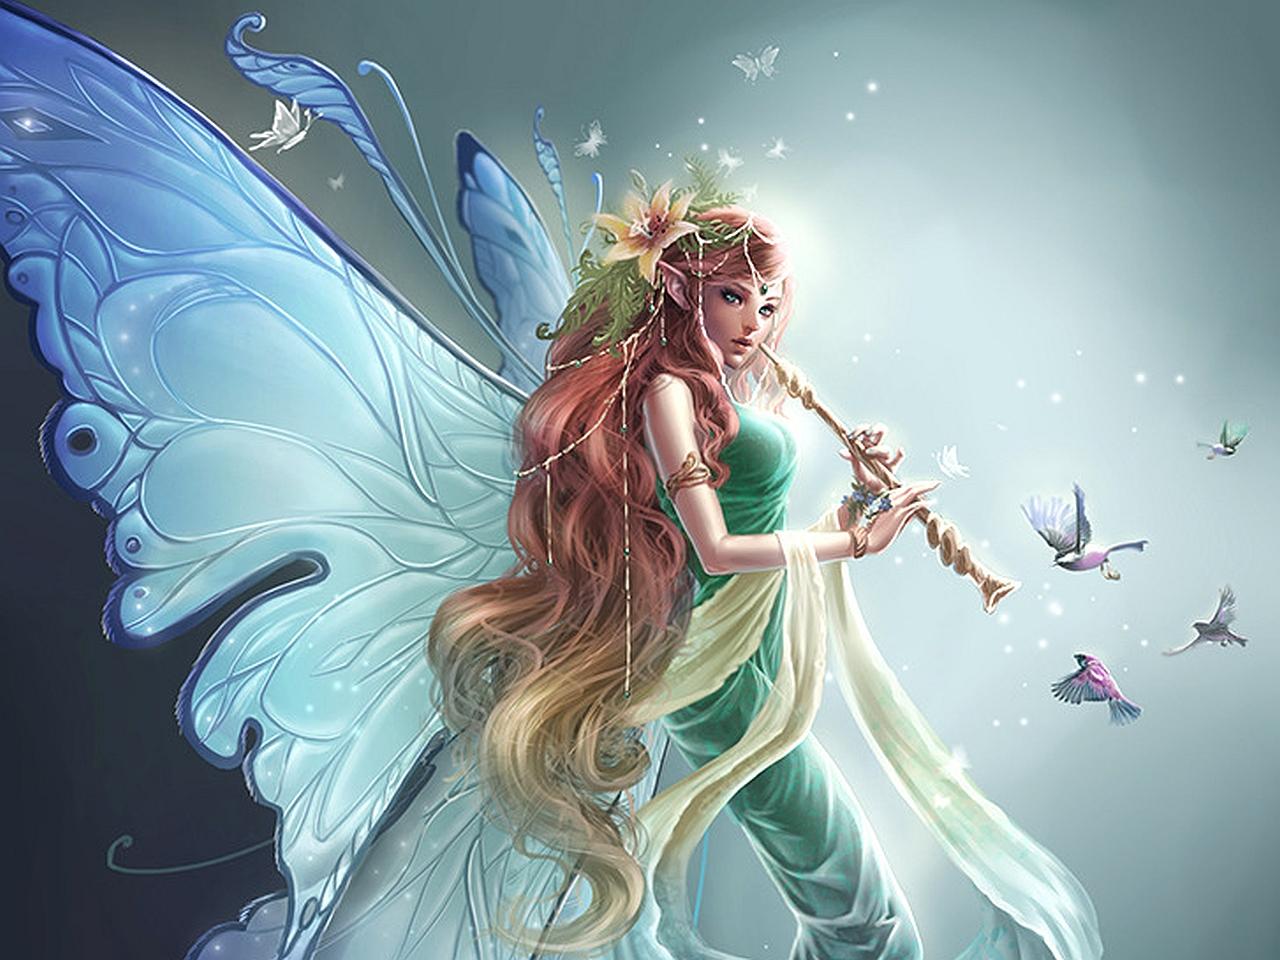 Fairy Computer Wallpapers Desktop Backgrounds 1280x960 ID383443 1280x960